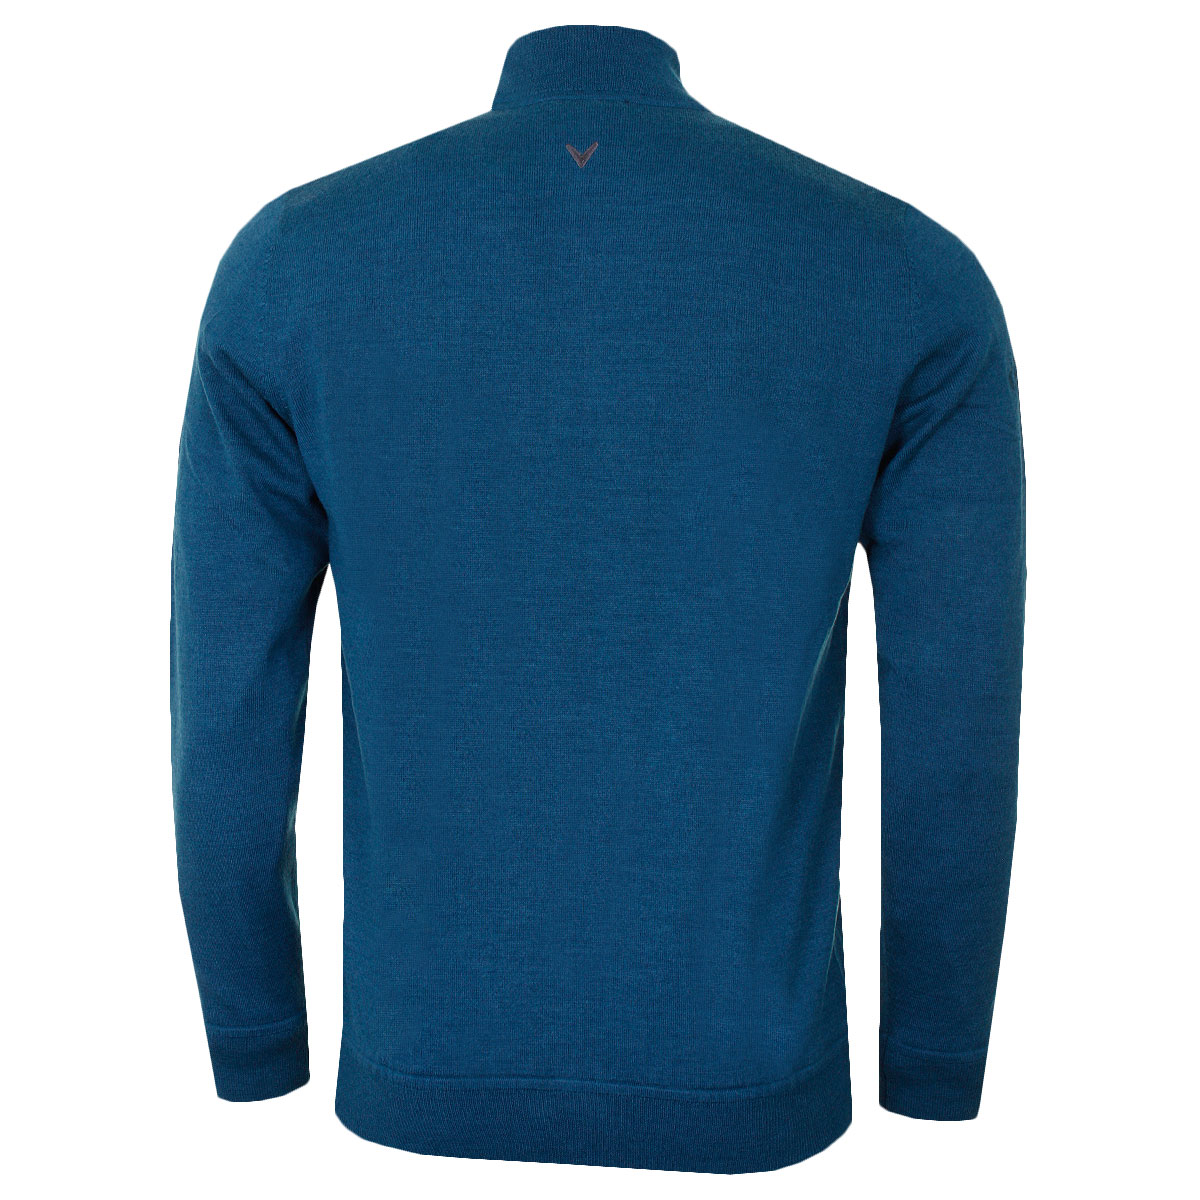 Callaway-Golf-Mens-1-4-Zip-Mock-Merino-Windproof-Sweater-Pullover-43-OFF-RRP thumbnail 9